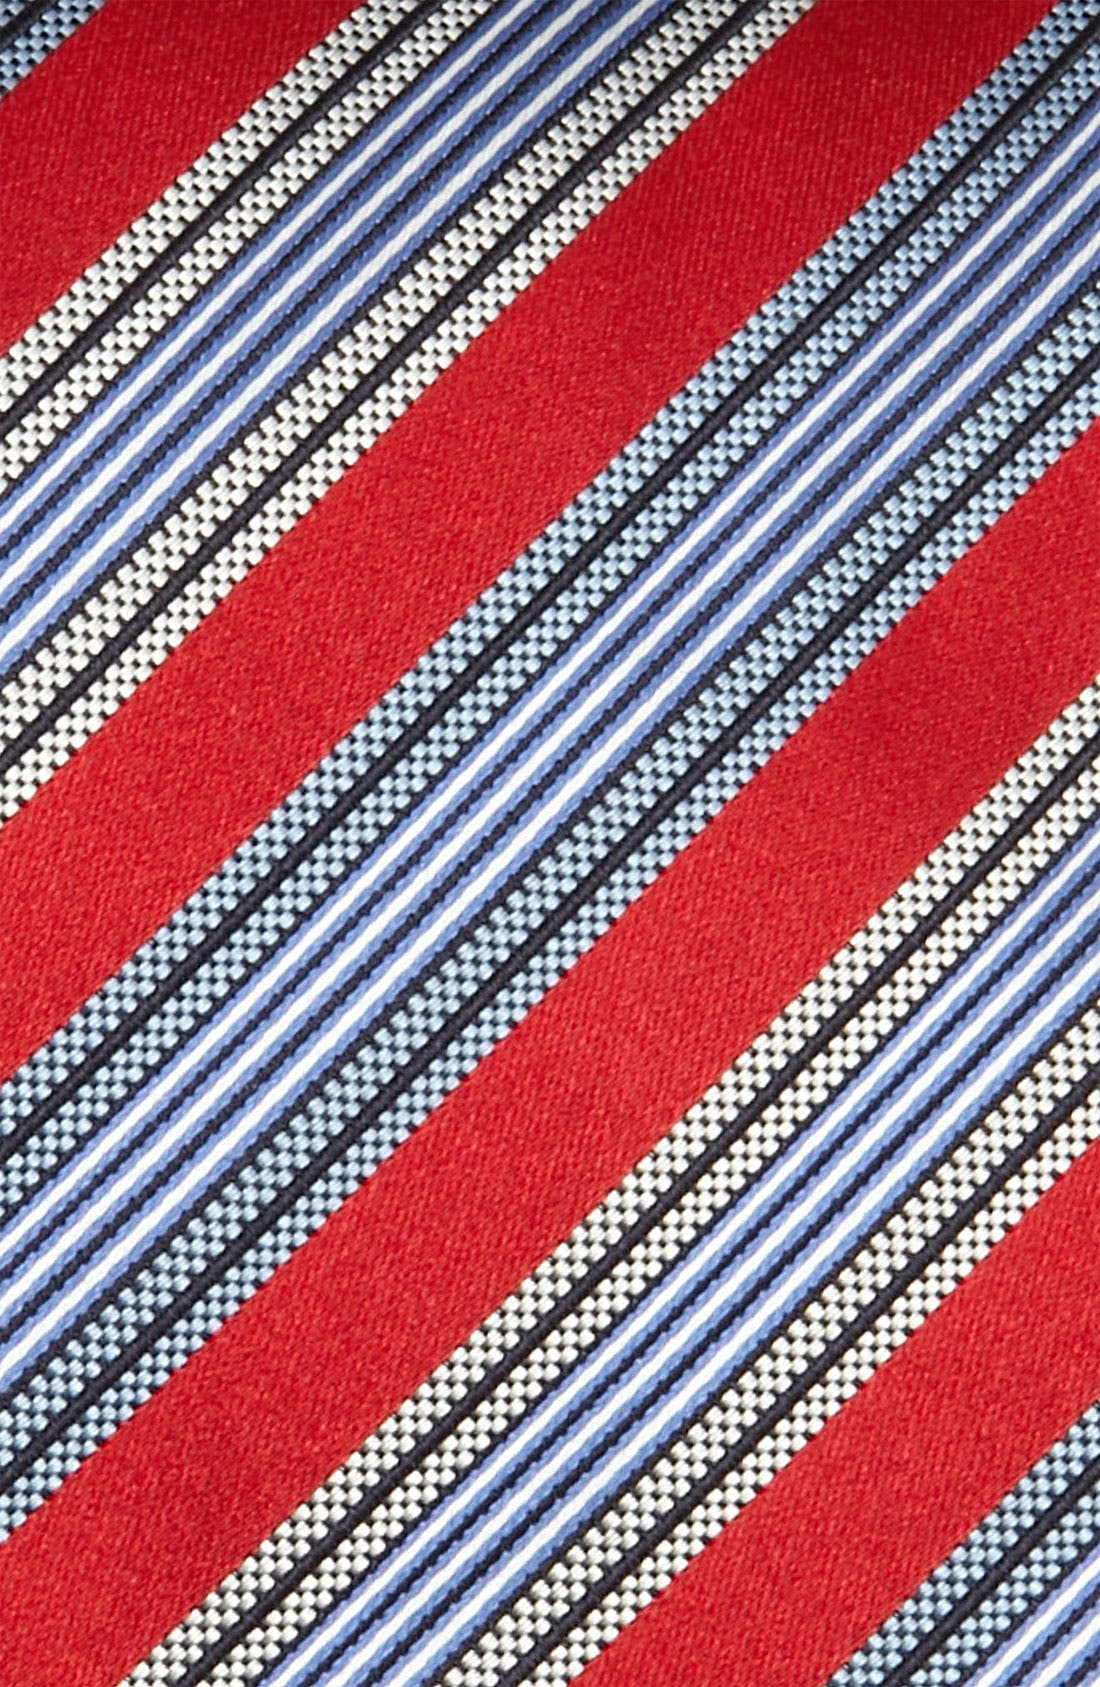 Woven Silk Tie,                             Alternate thumbnail 2, color,                             614